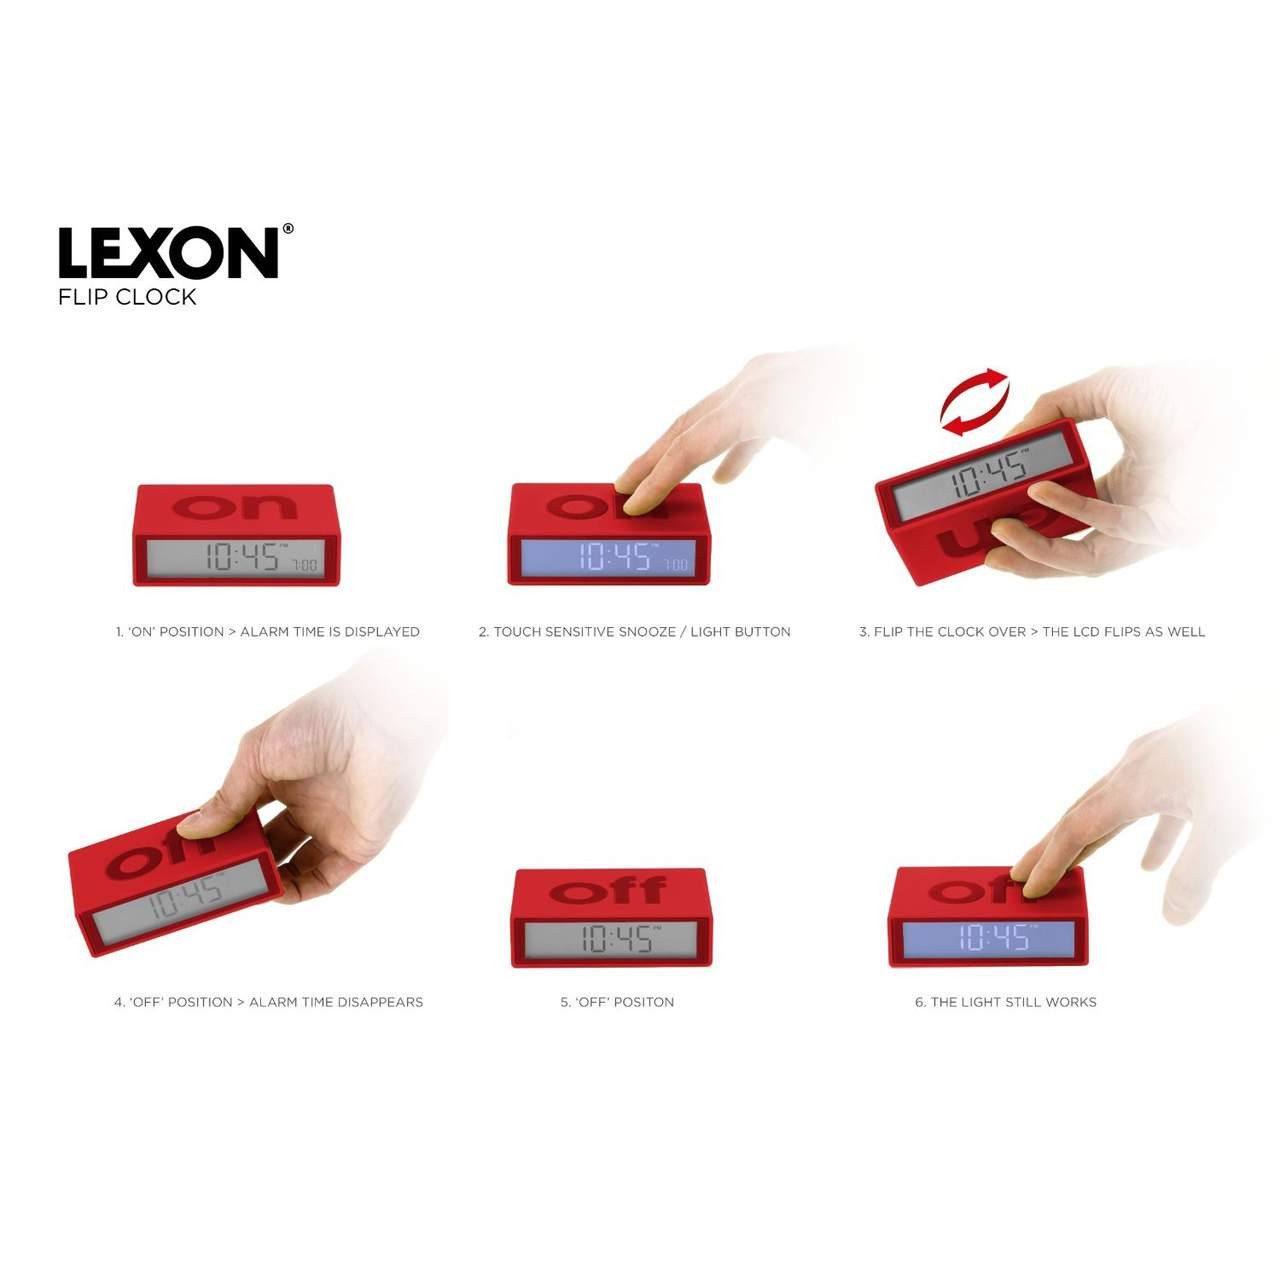 LEXON Flip LCD alarm clock LR130MX gunmetal